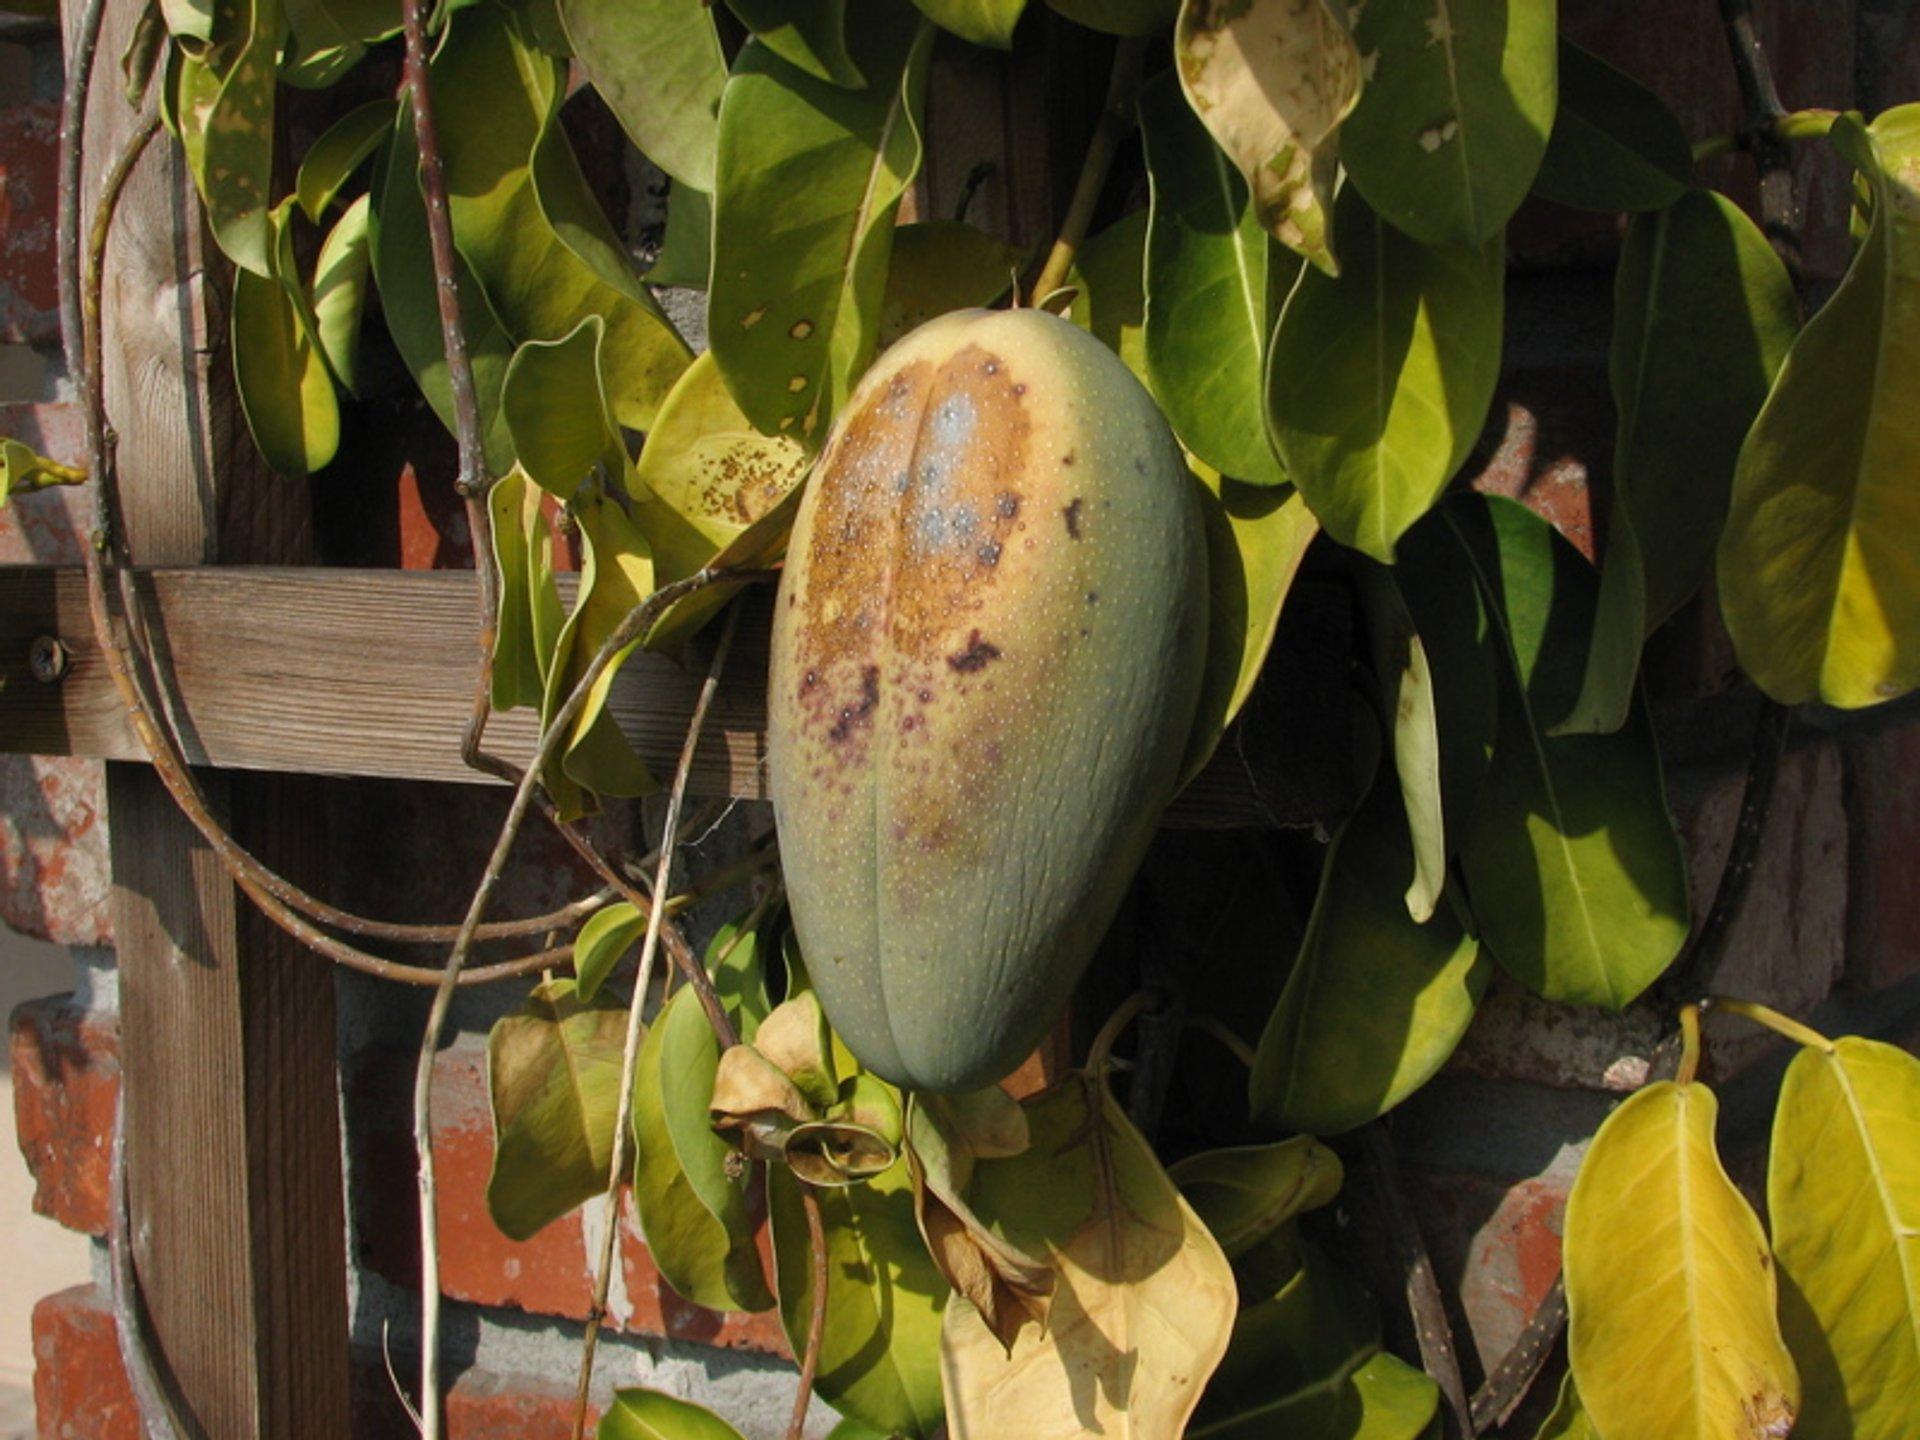 Exotic Fruits Season in Madagascar - Best Season